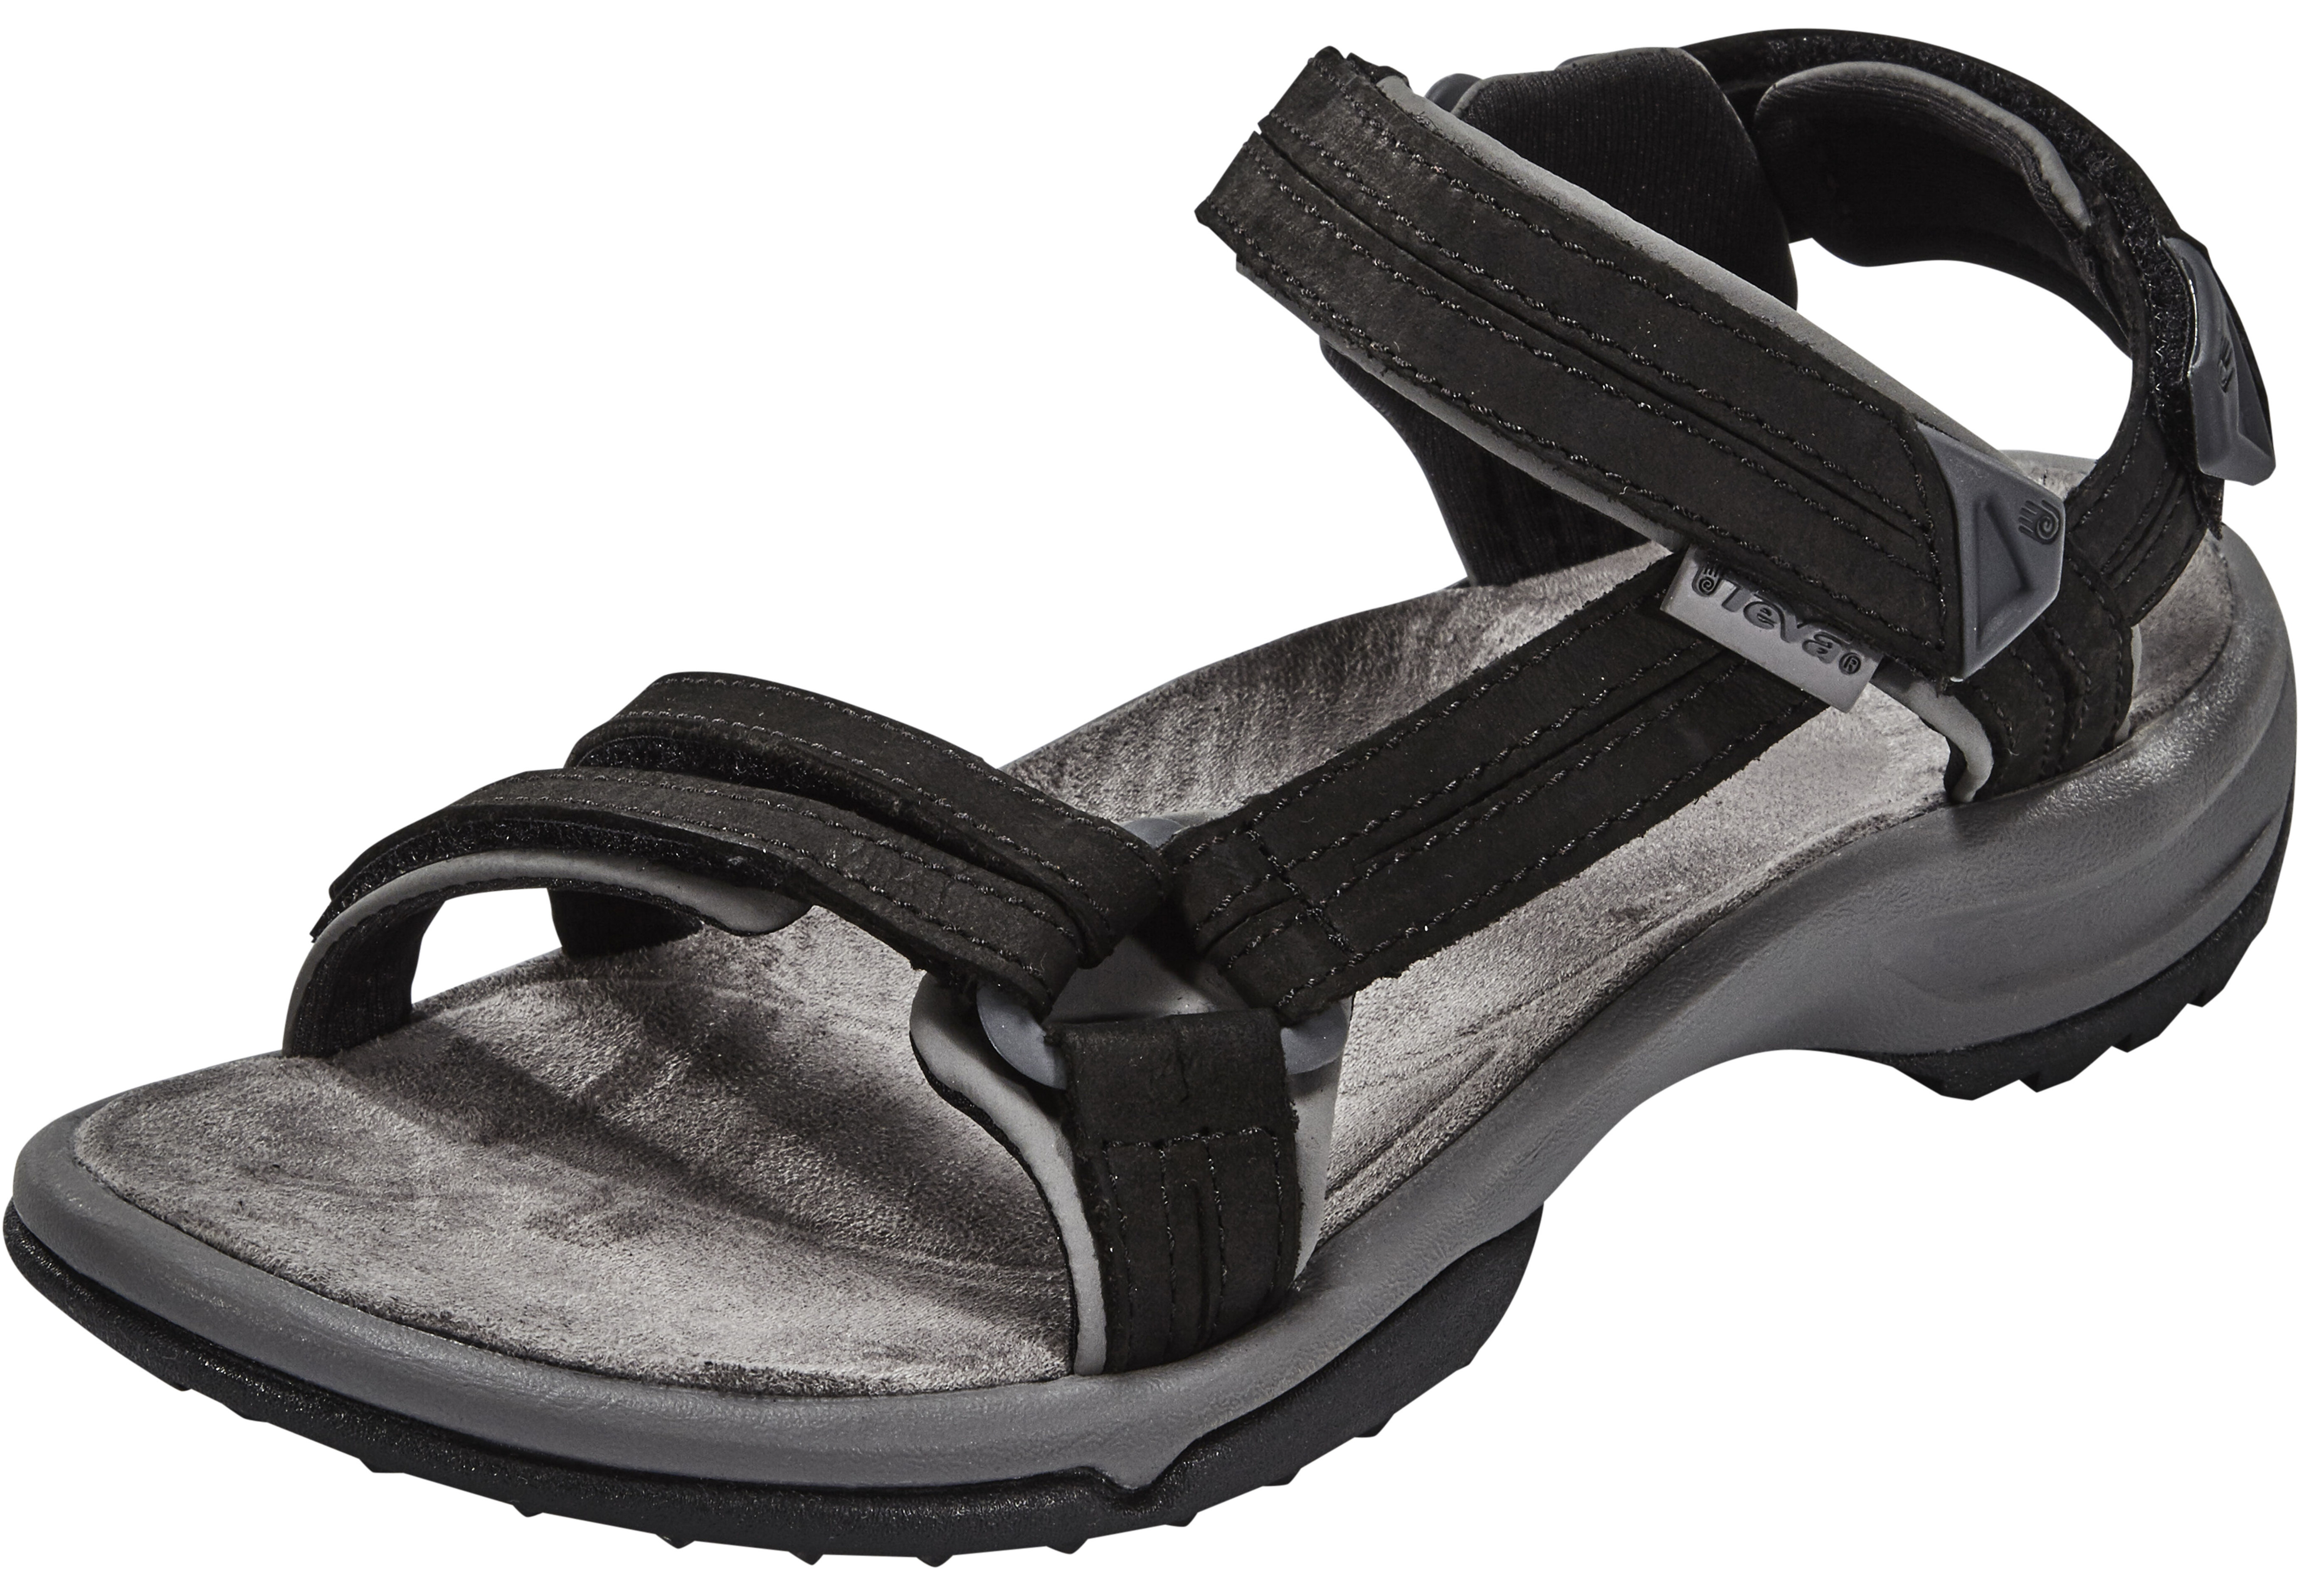 867075c39ab24d Teva Terra Fi Lite Leather Sandals Women black at Addnature.co.uk